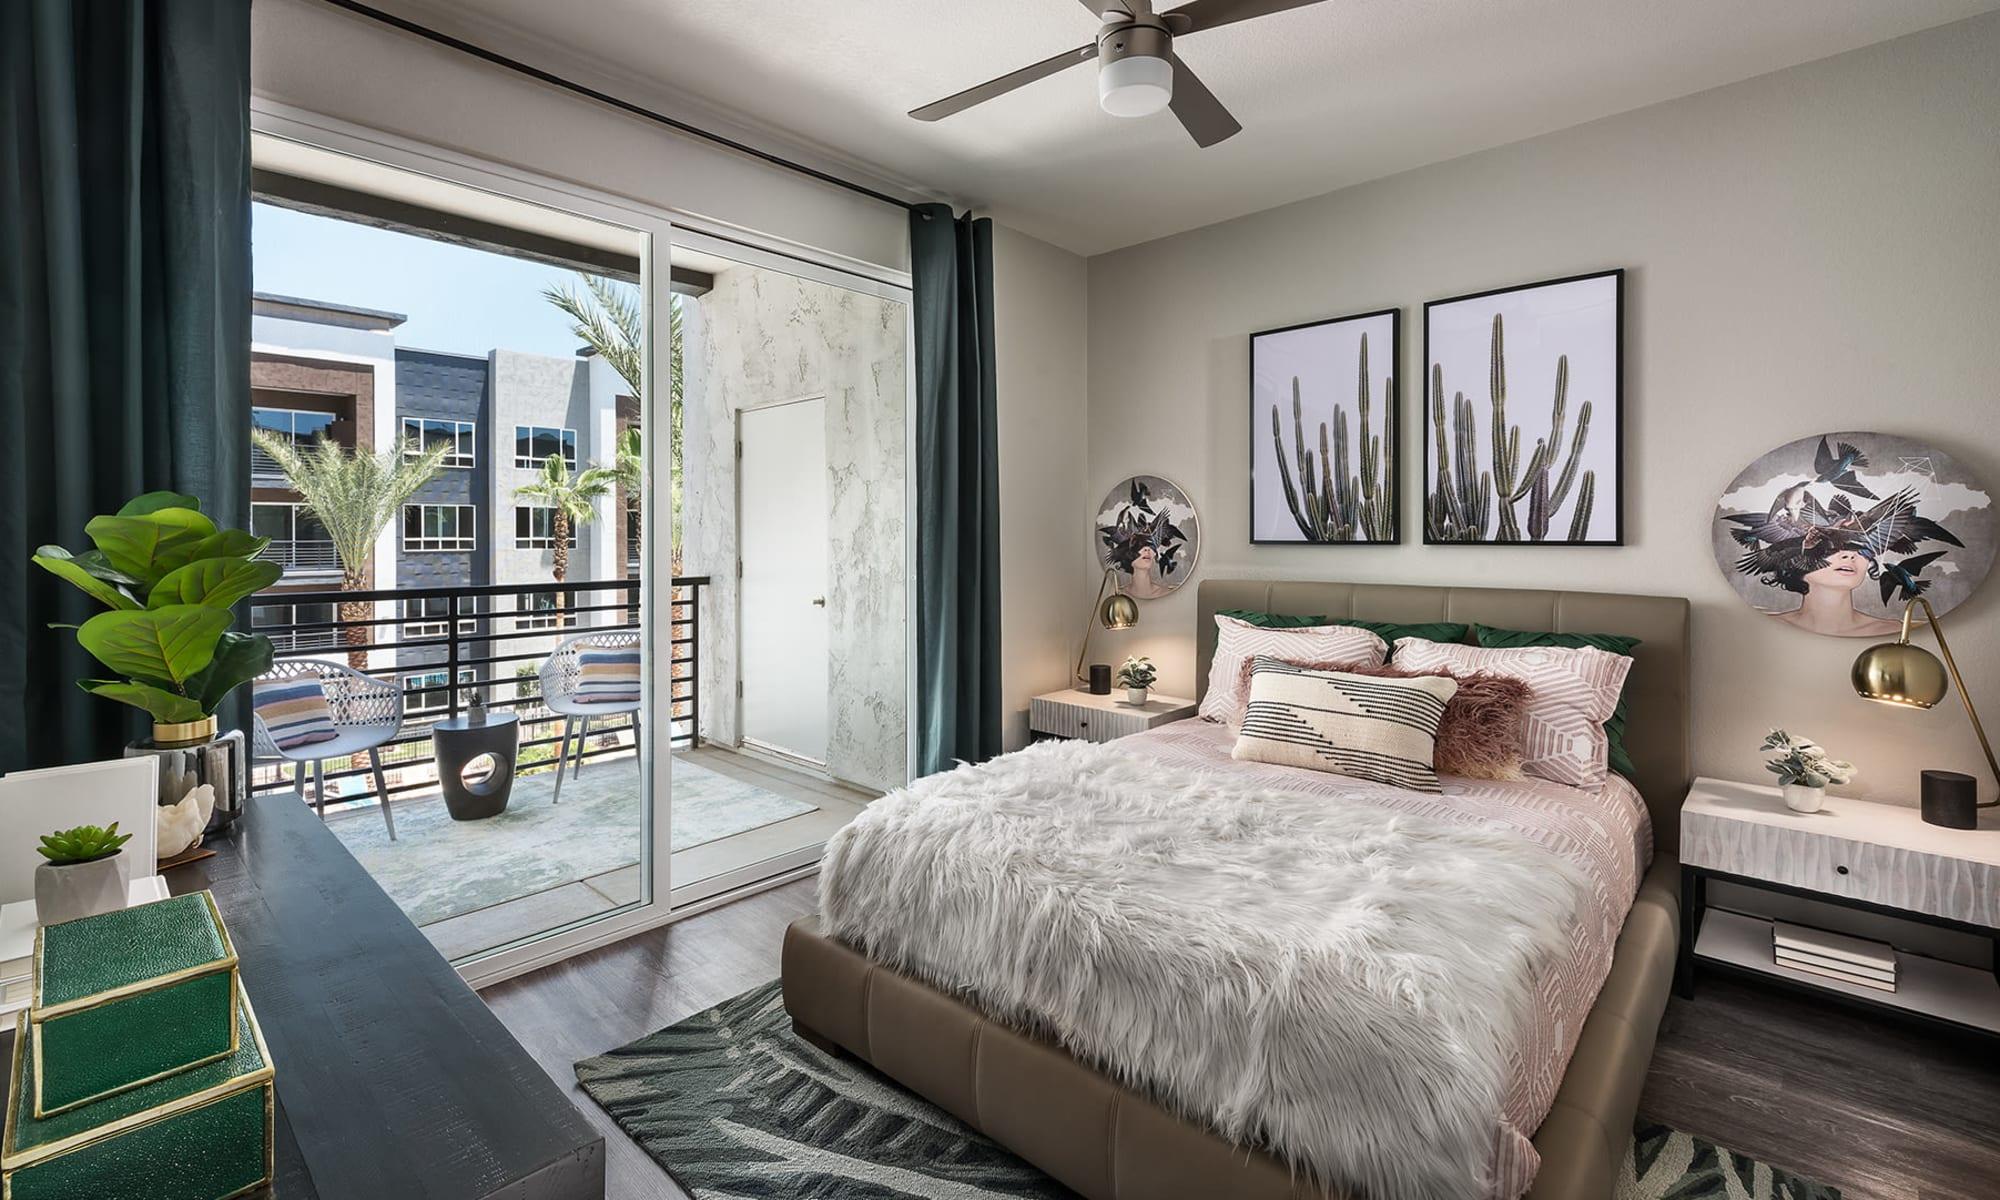 ArLo Apartments in Phoenix, Arizona